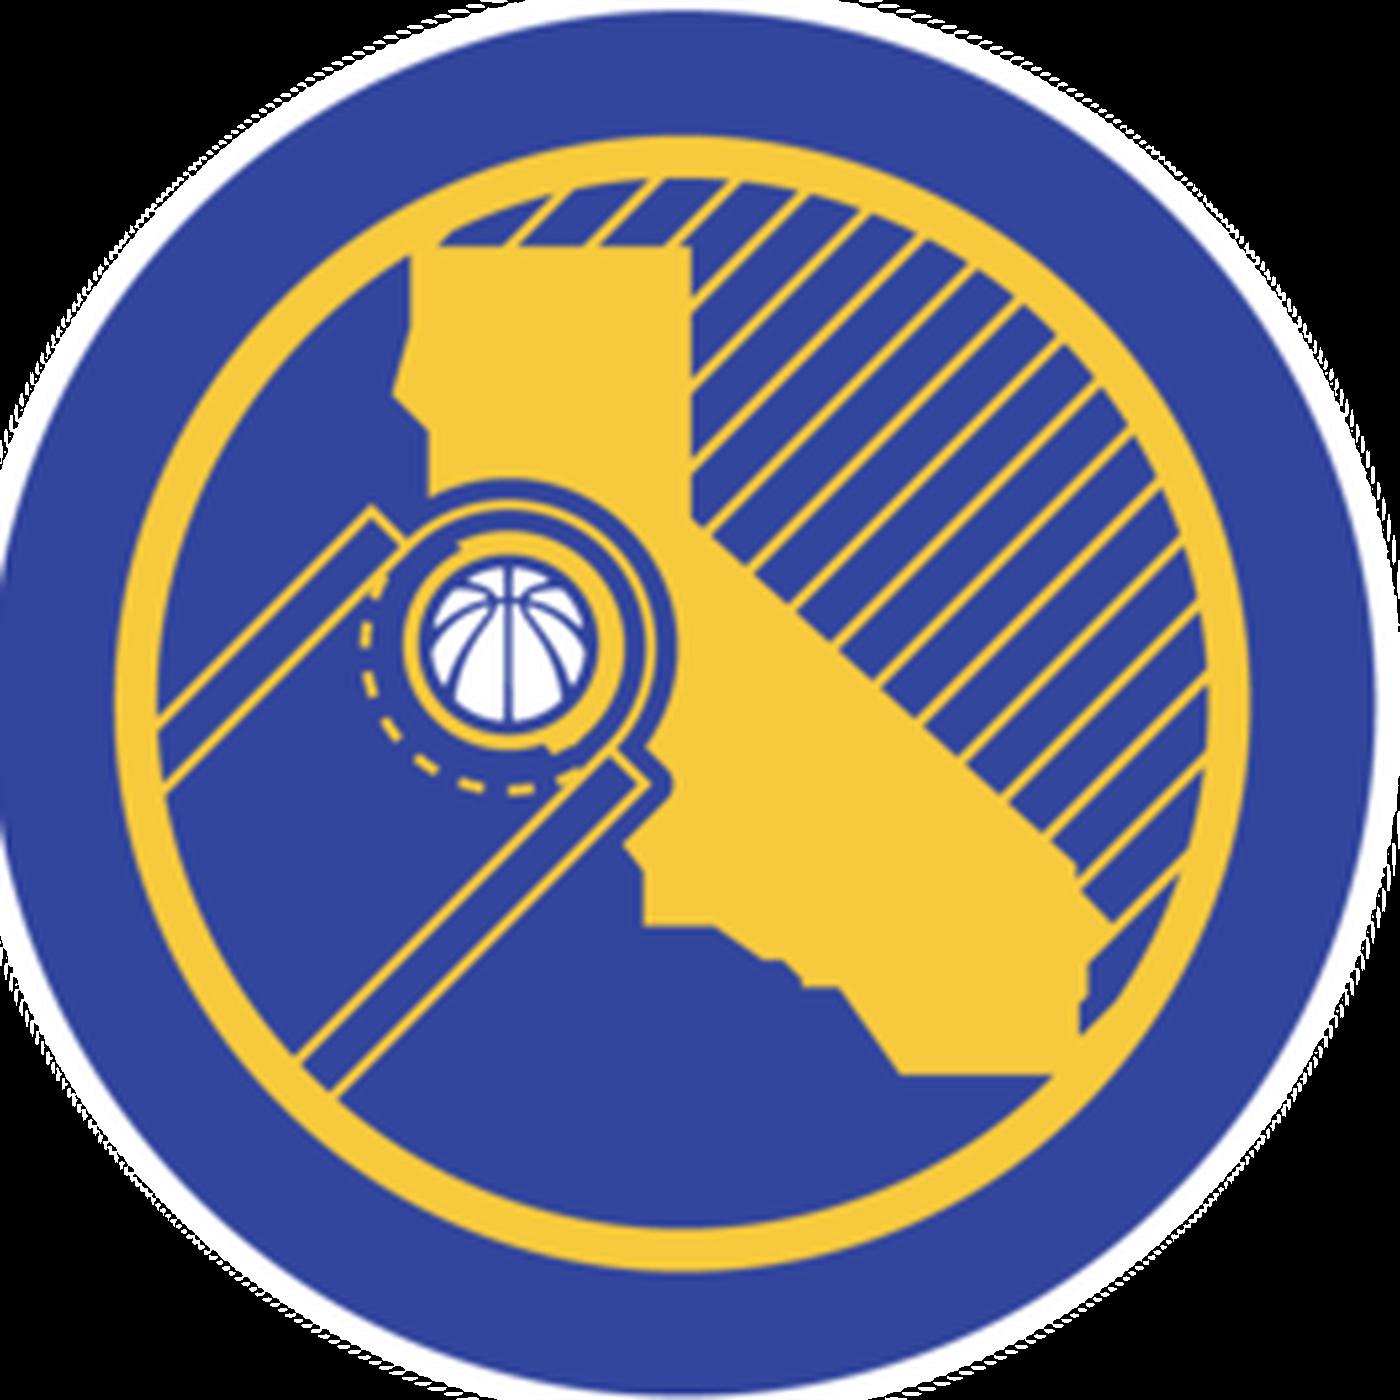 Back of basketball golden state jersey clipart jpg stock Golden State Warriors to sport Alternate Golden State D-League ... jpg stock